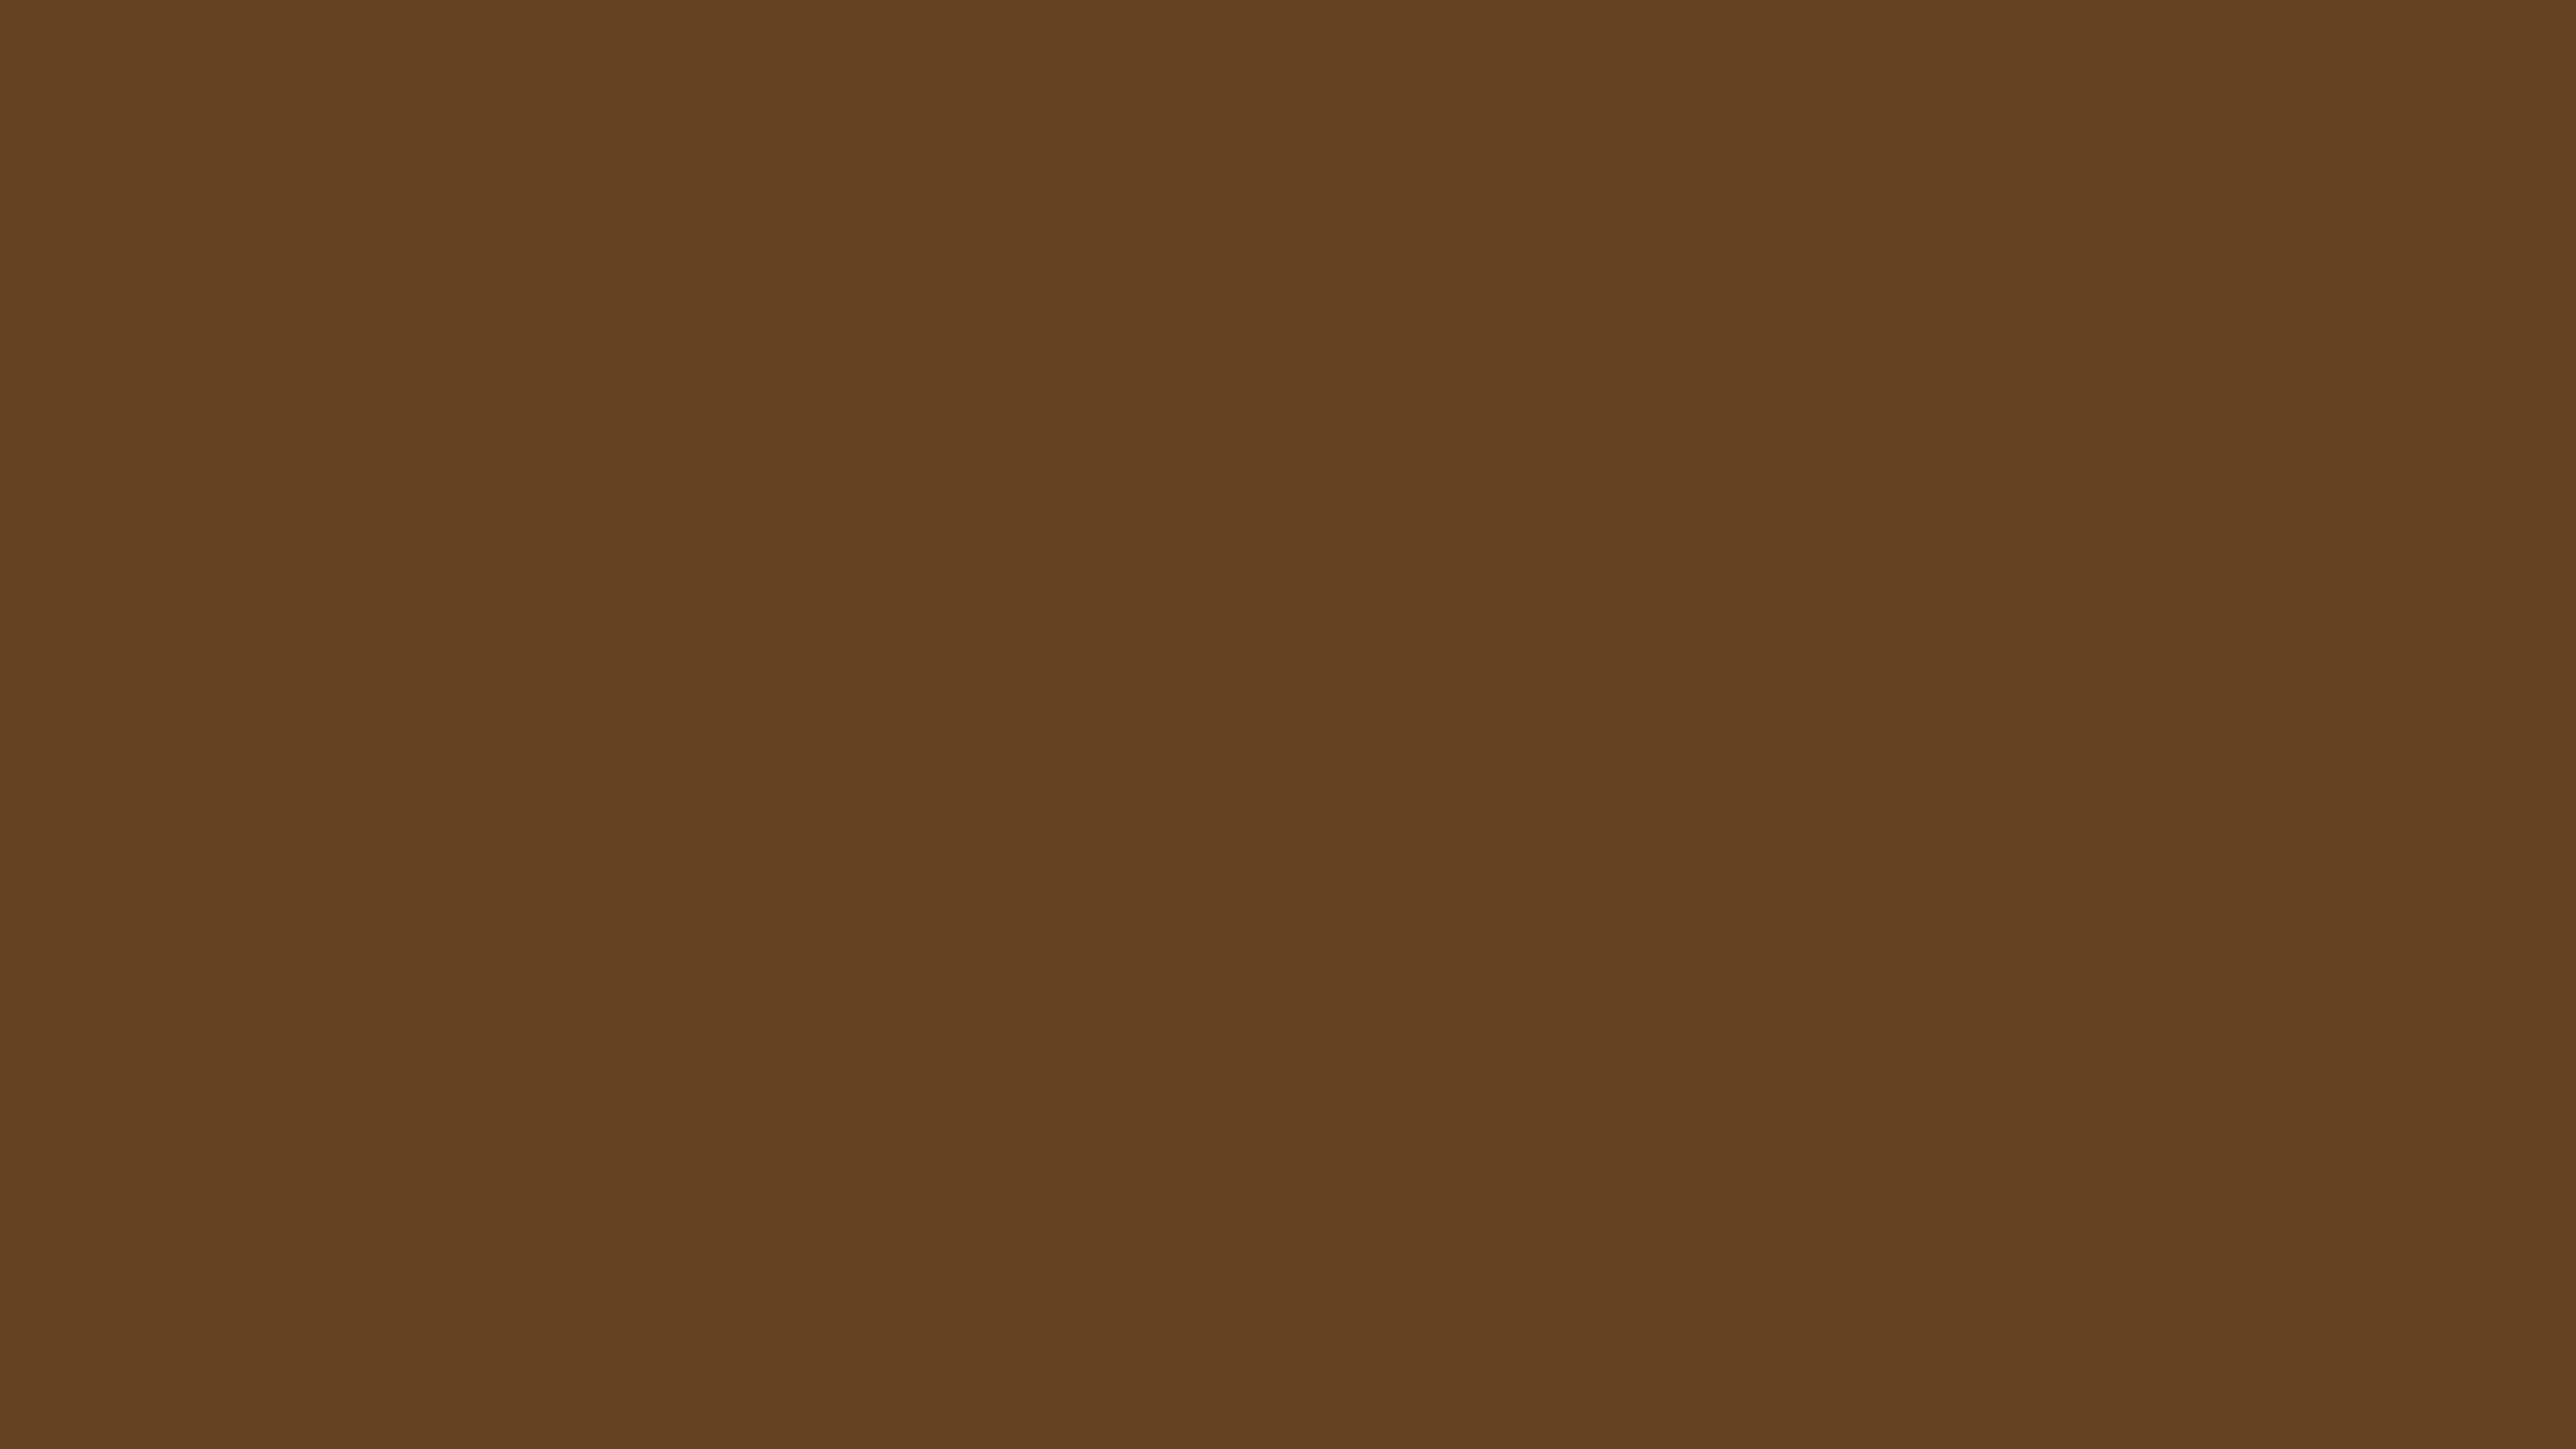 5120x2880 Dark Brown Solid Color Background